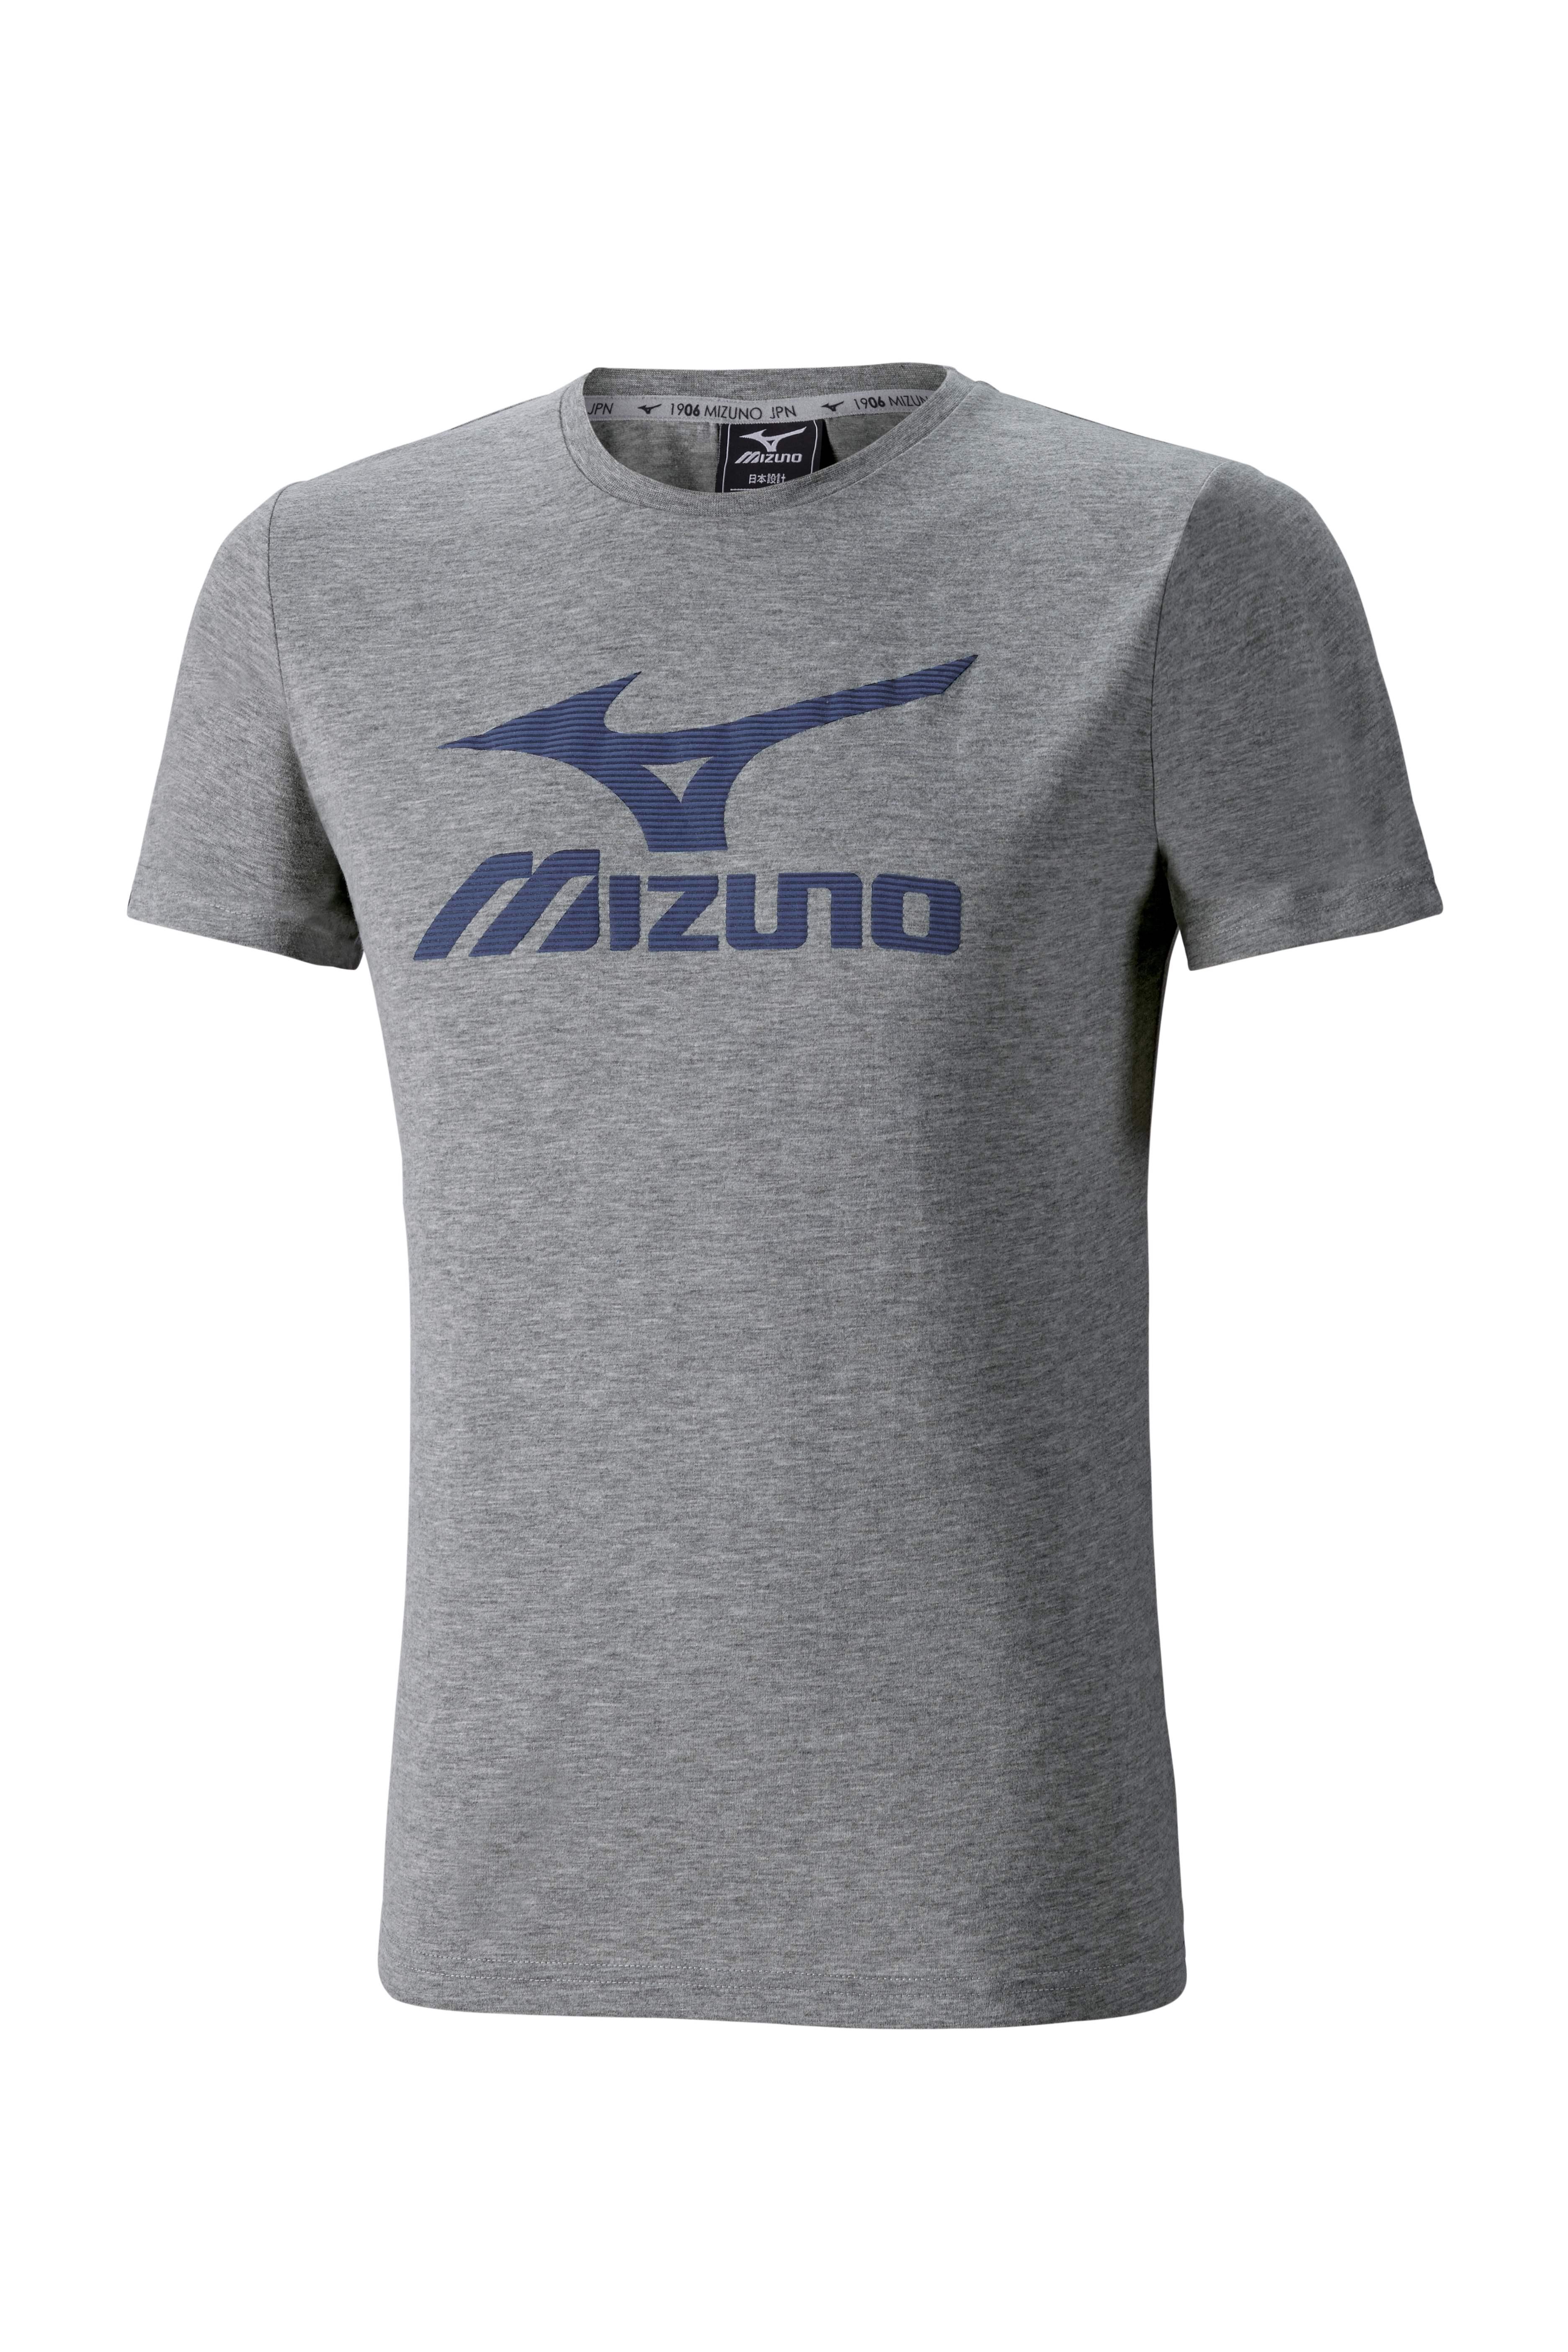 Mizuno Big Logo Tee K2EA668607 L